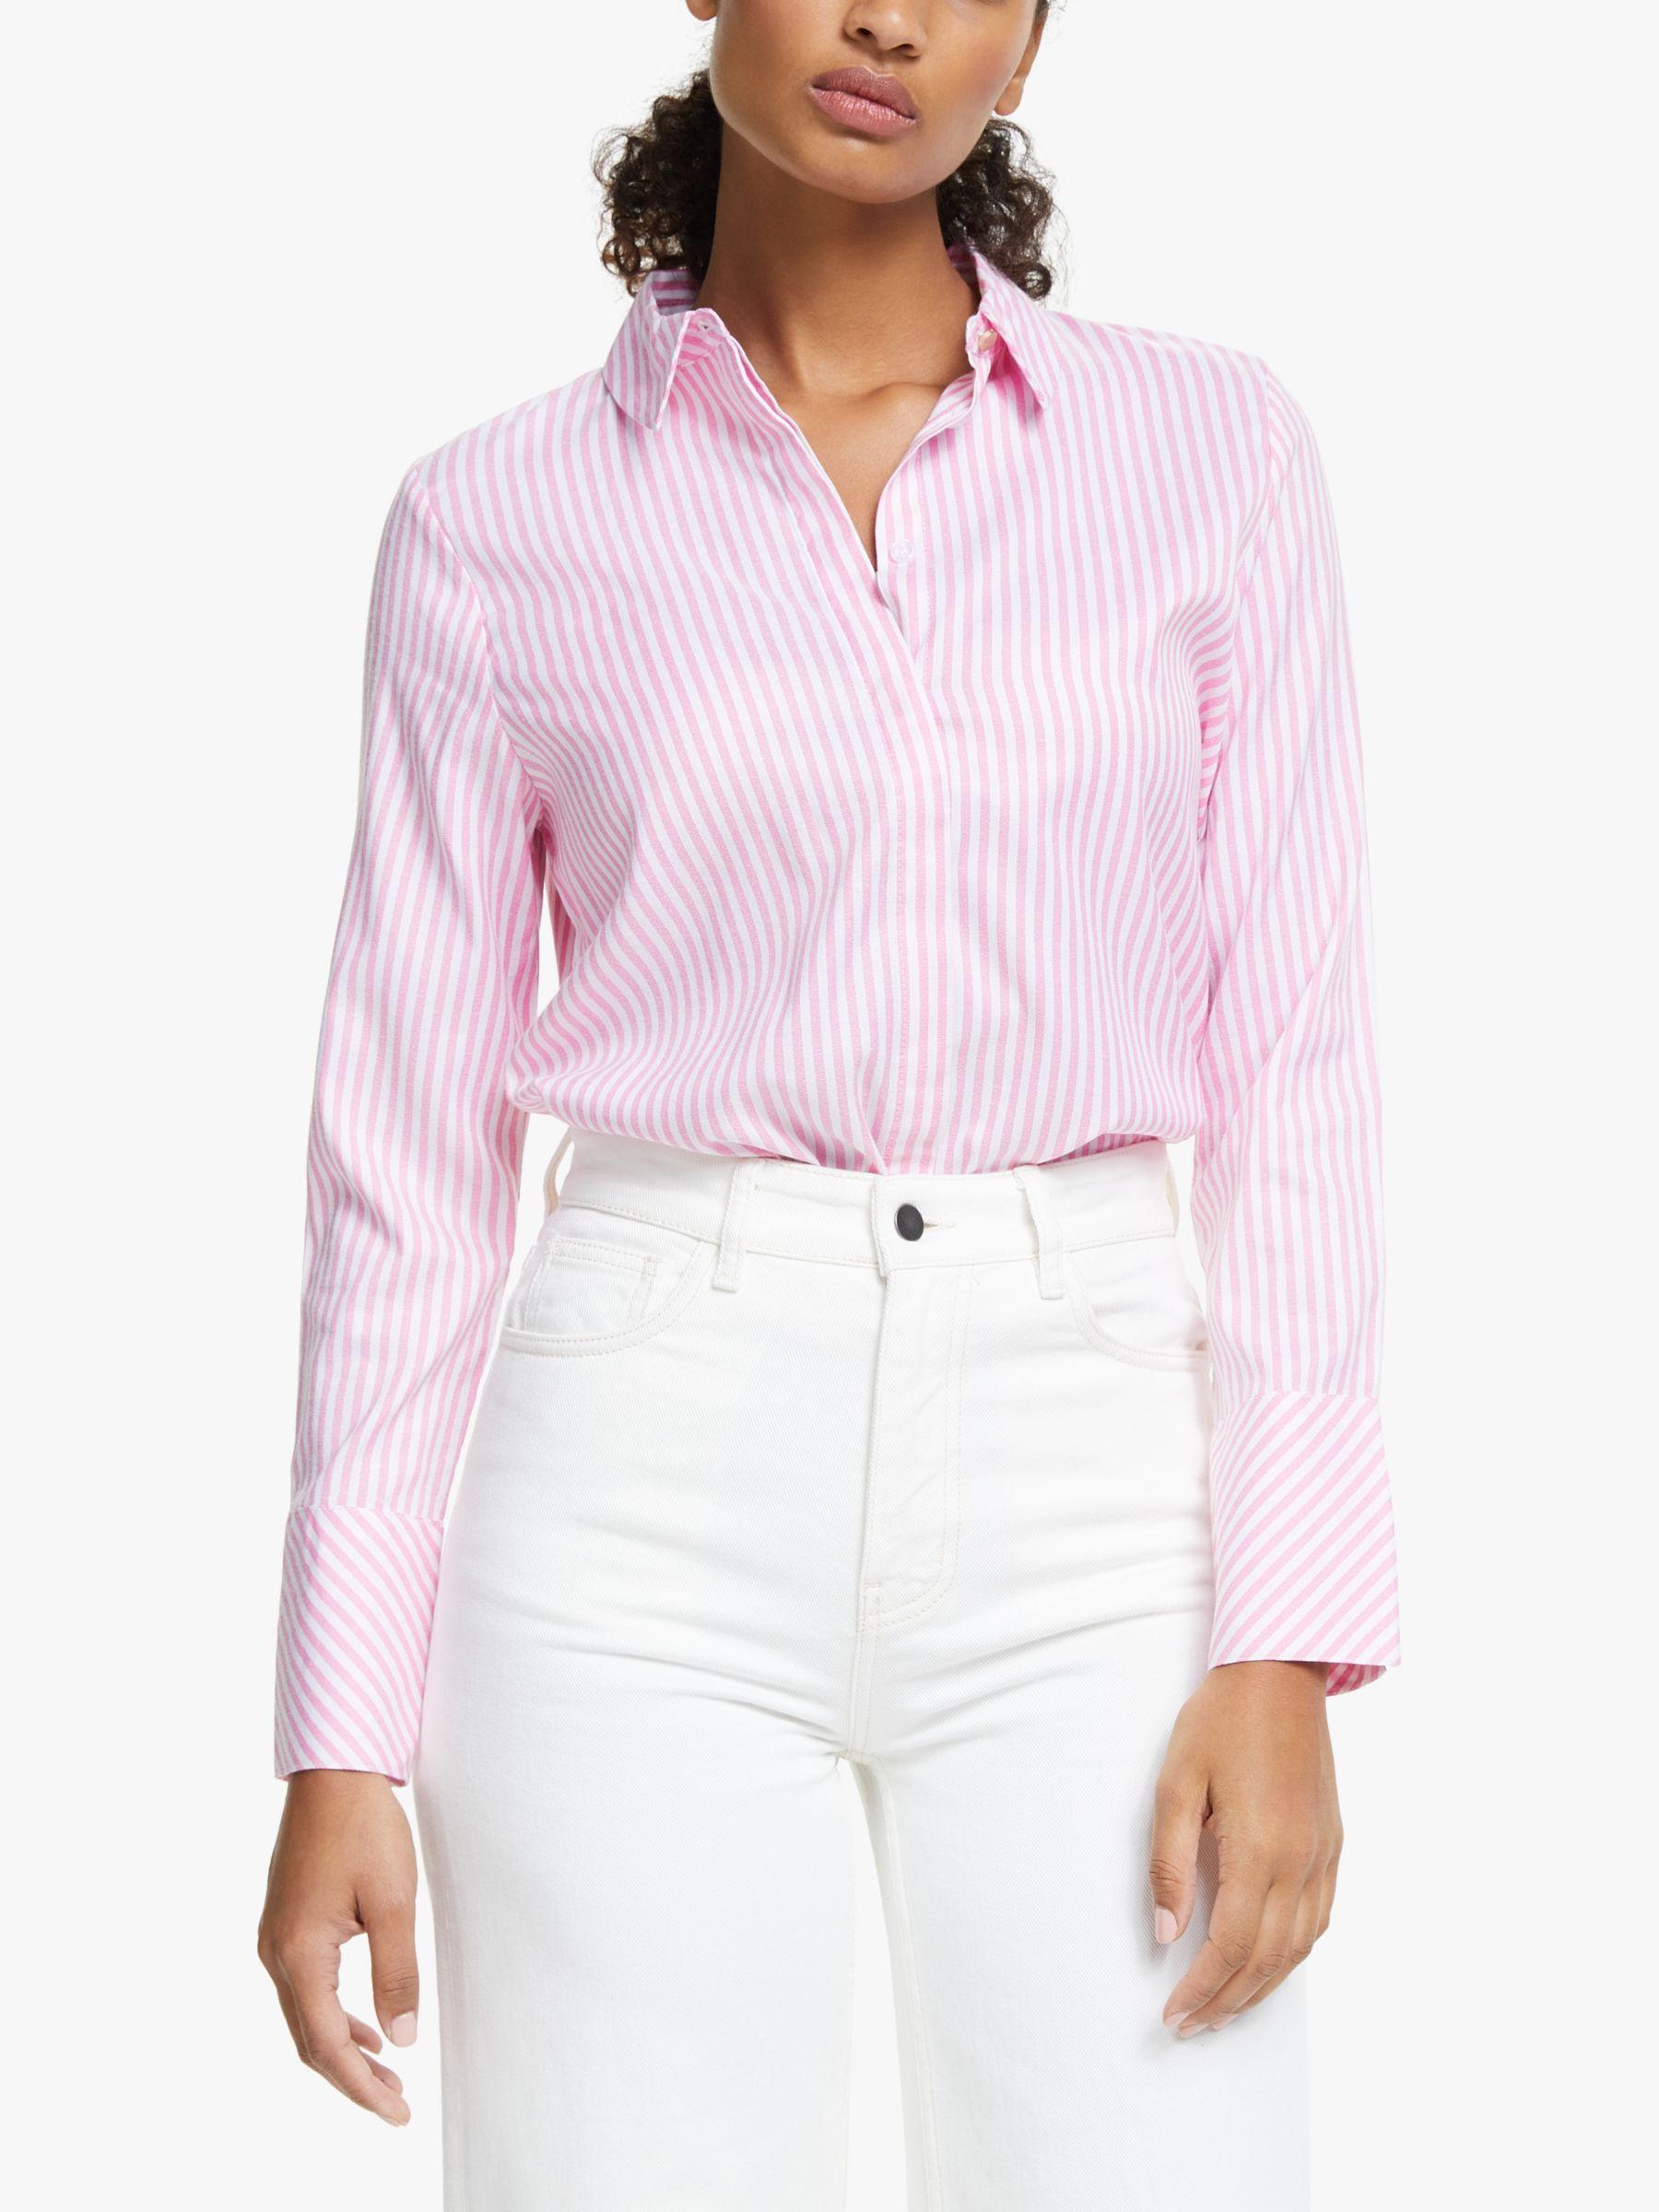 Numph Numph Nuaiden Stripe Shirt, Pink Carnation